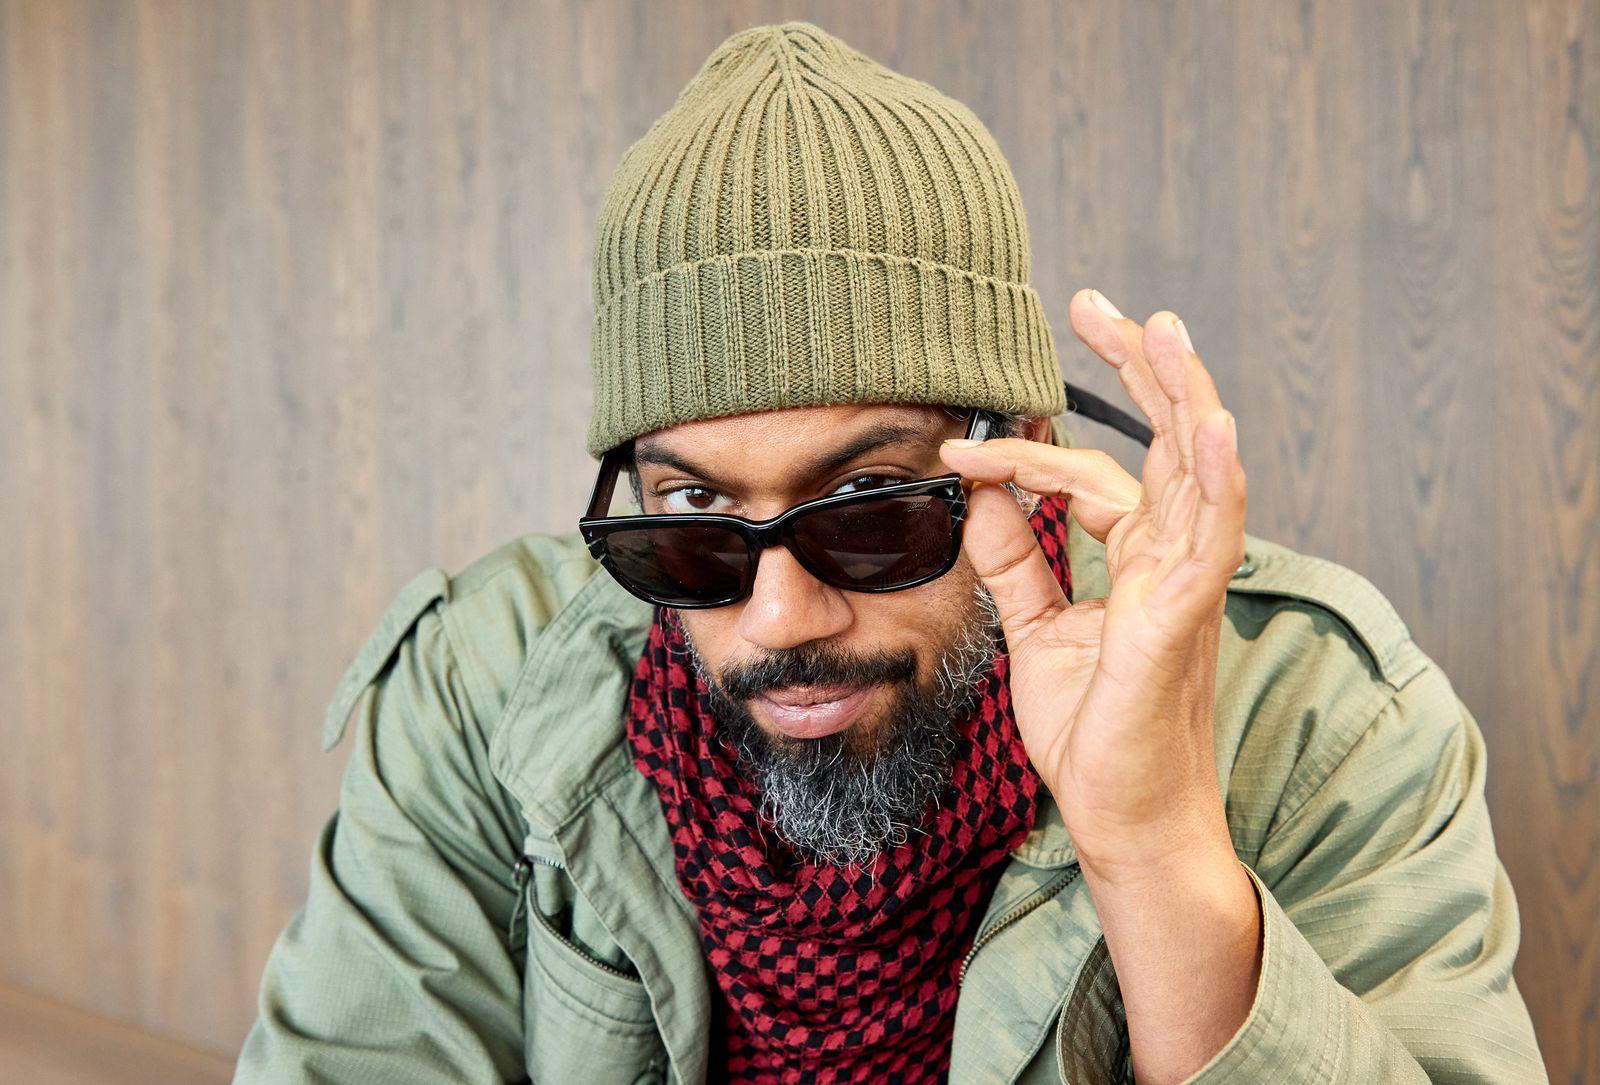 Rapper Samy Deluxe